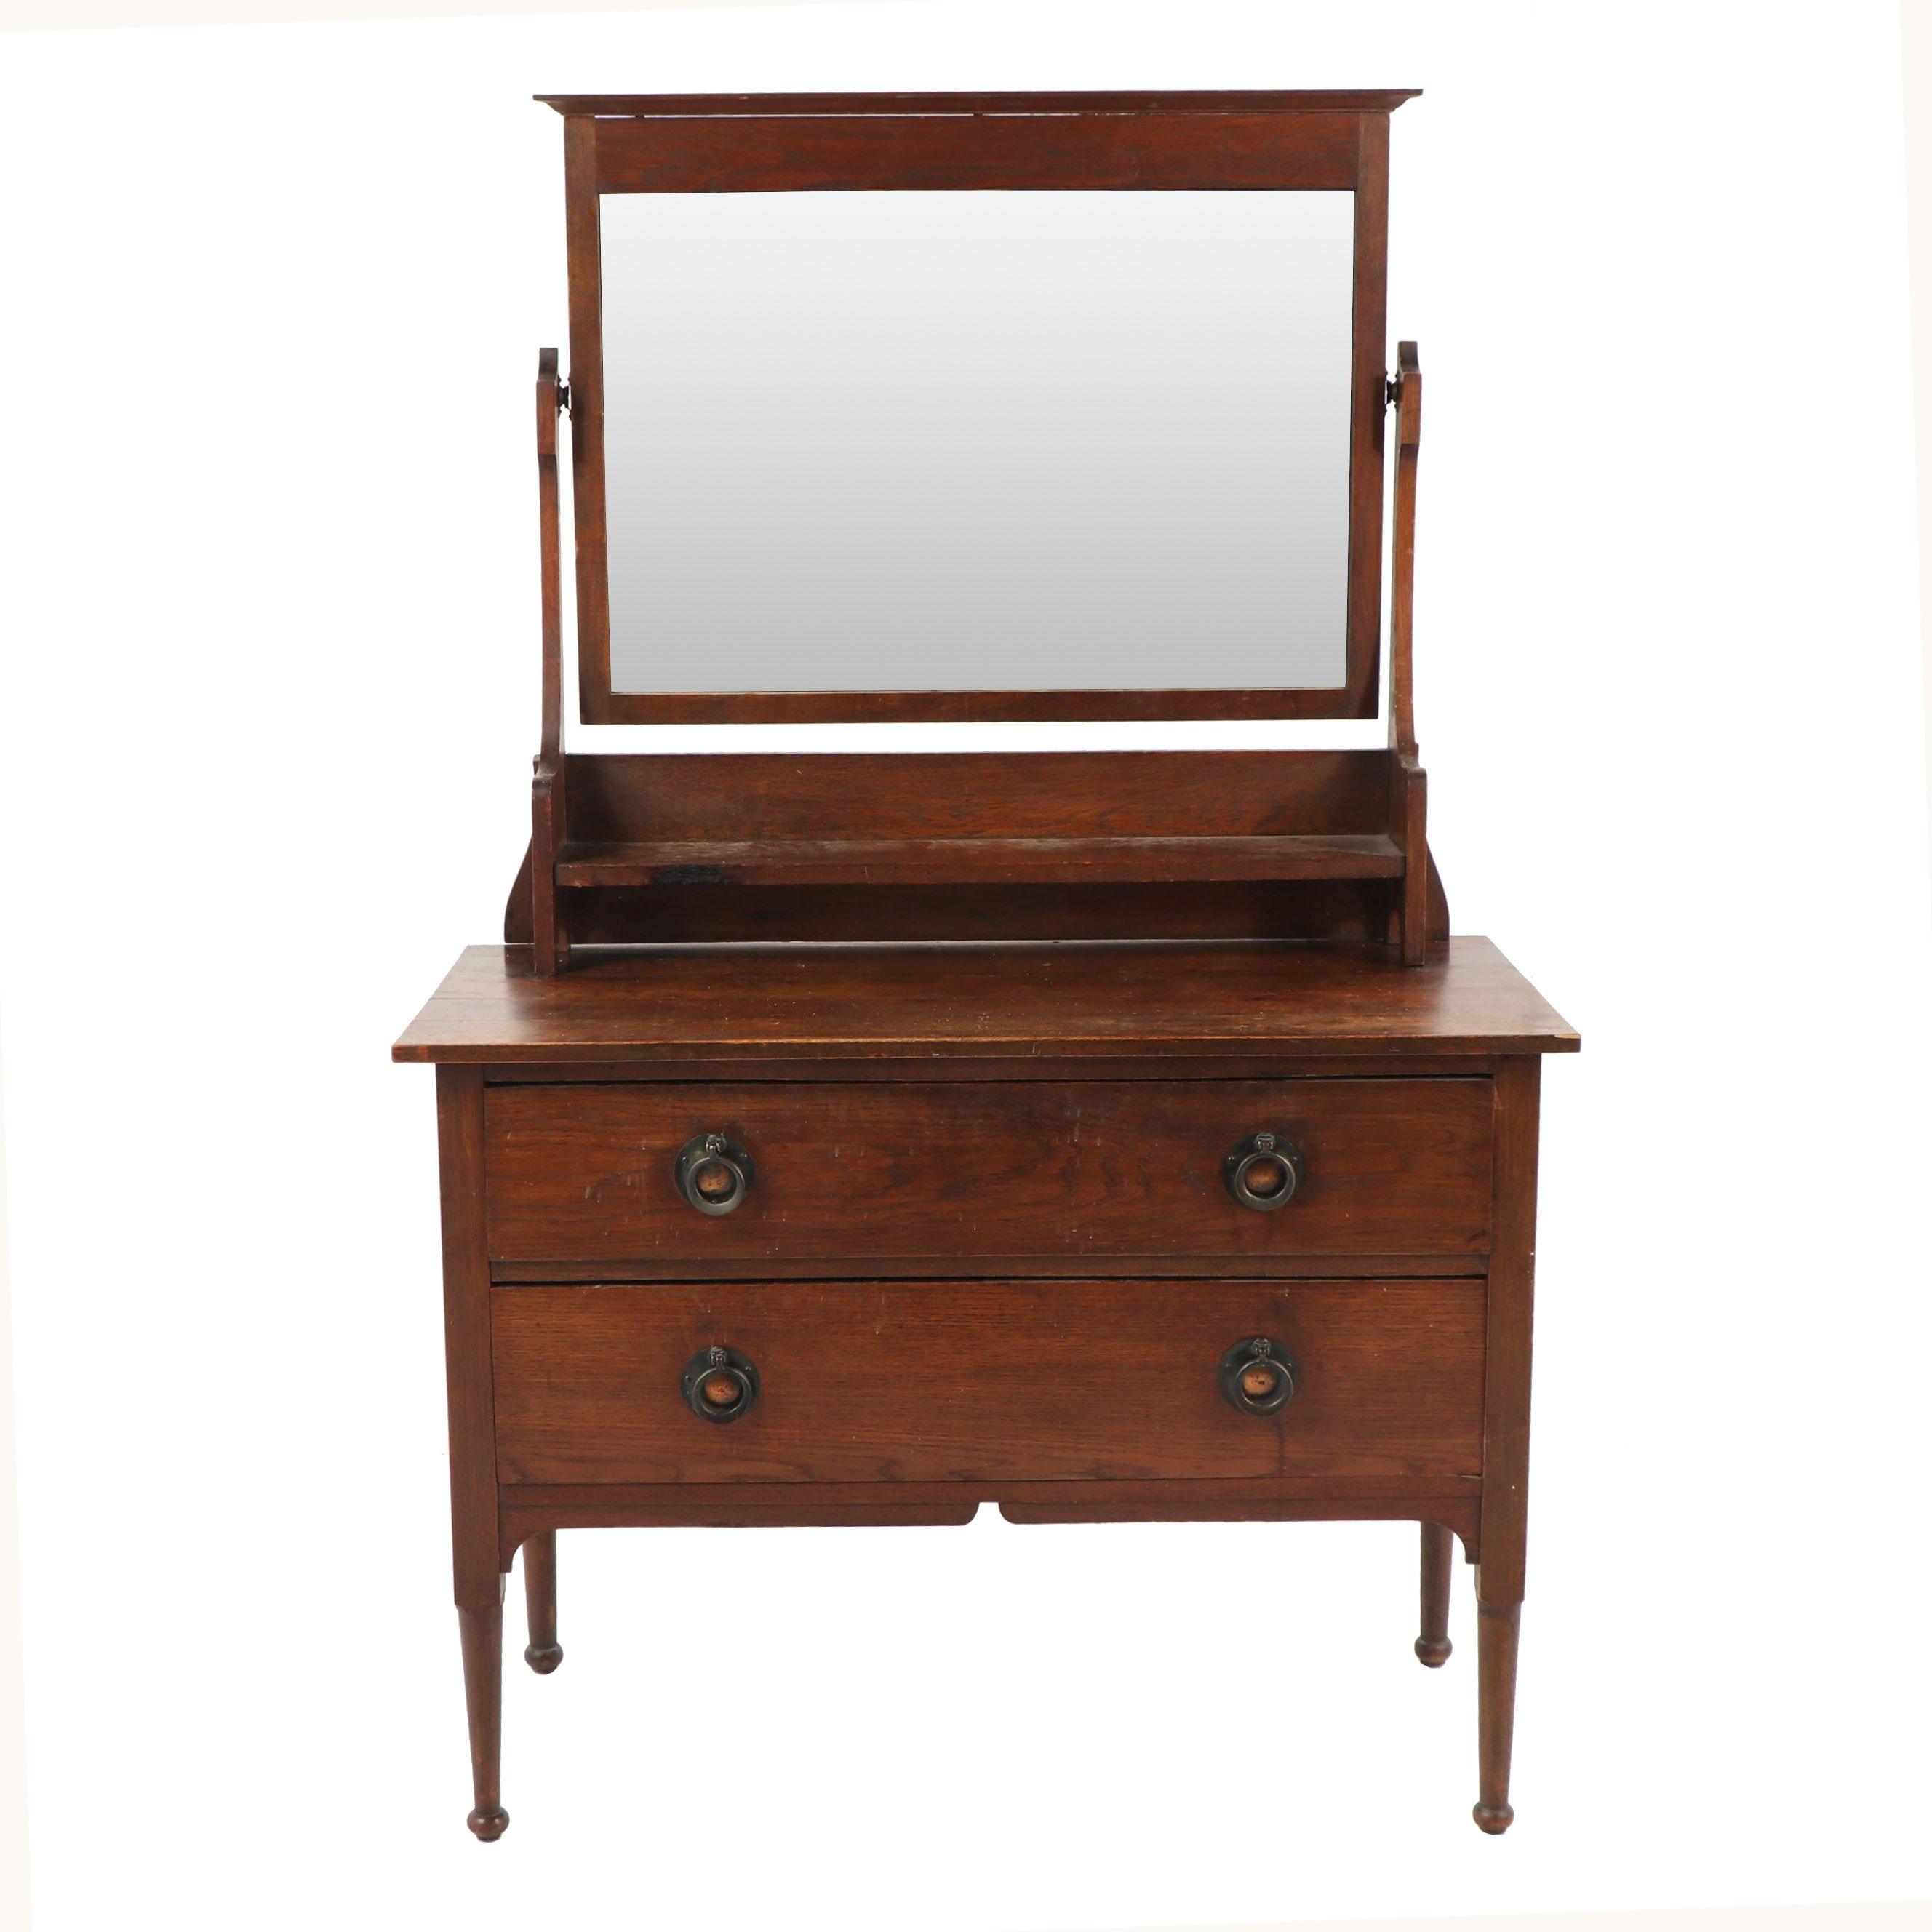 Walnut Dresser with Adjustable Mirror, Early 19th Century